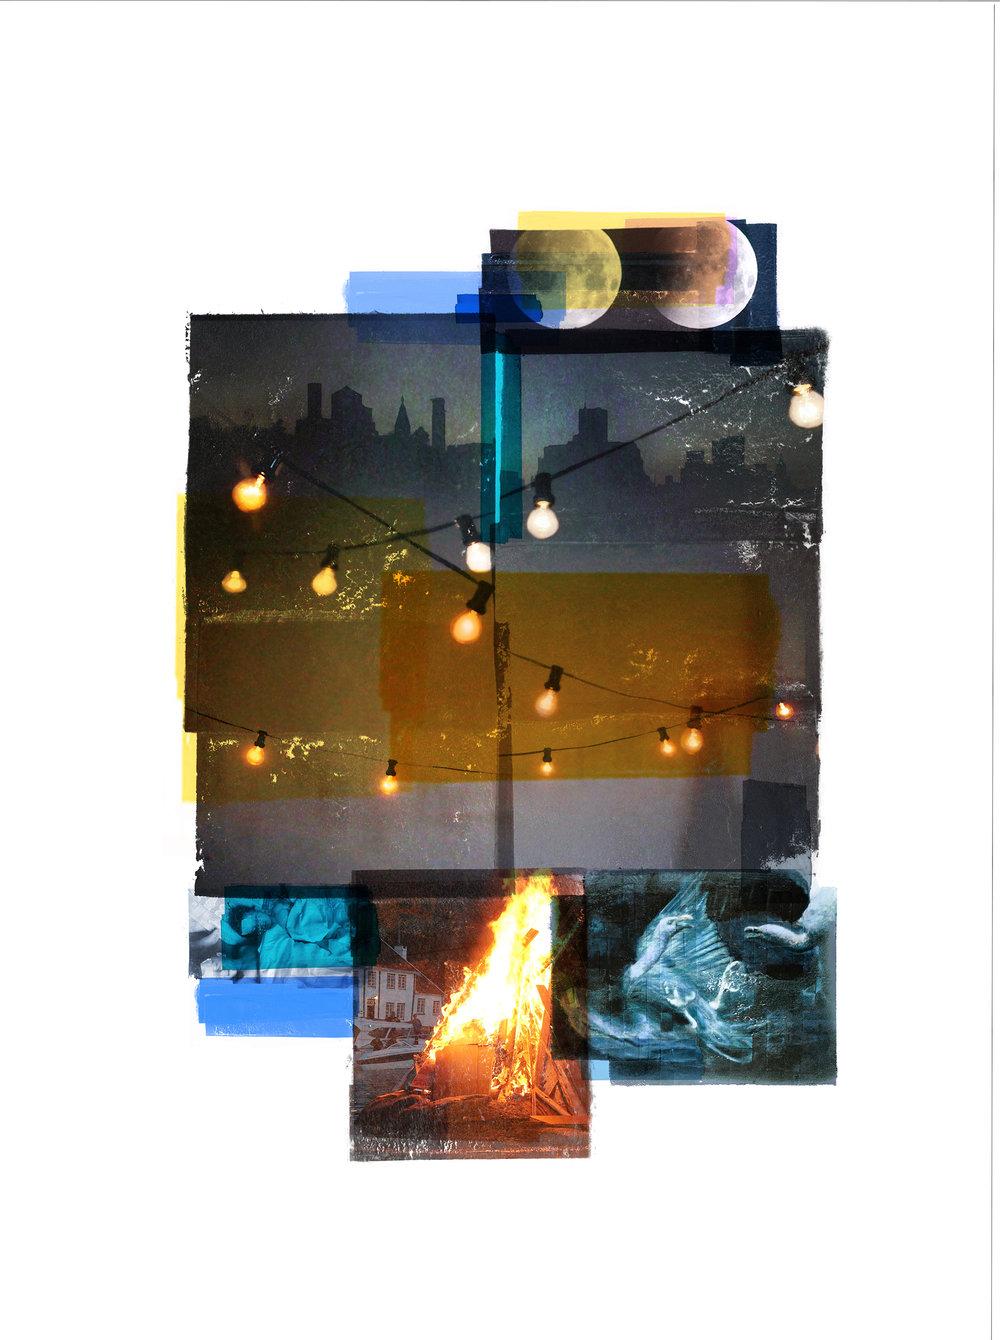 Rim of the party / Horizontal   Original Archival UV Pigment Print / BFK Rives 250 gr 31 x 23 cm / 12 x 9 in Edition of 50 + 7 Ap Editeur: Per Fronth Studios / Printer Henrik Aunevik  29/2016: